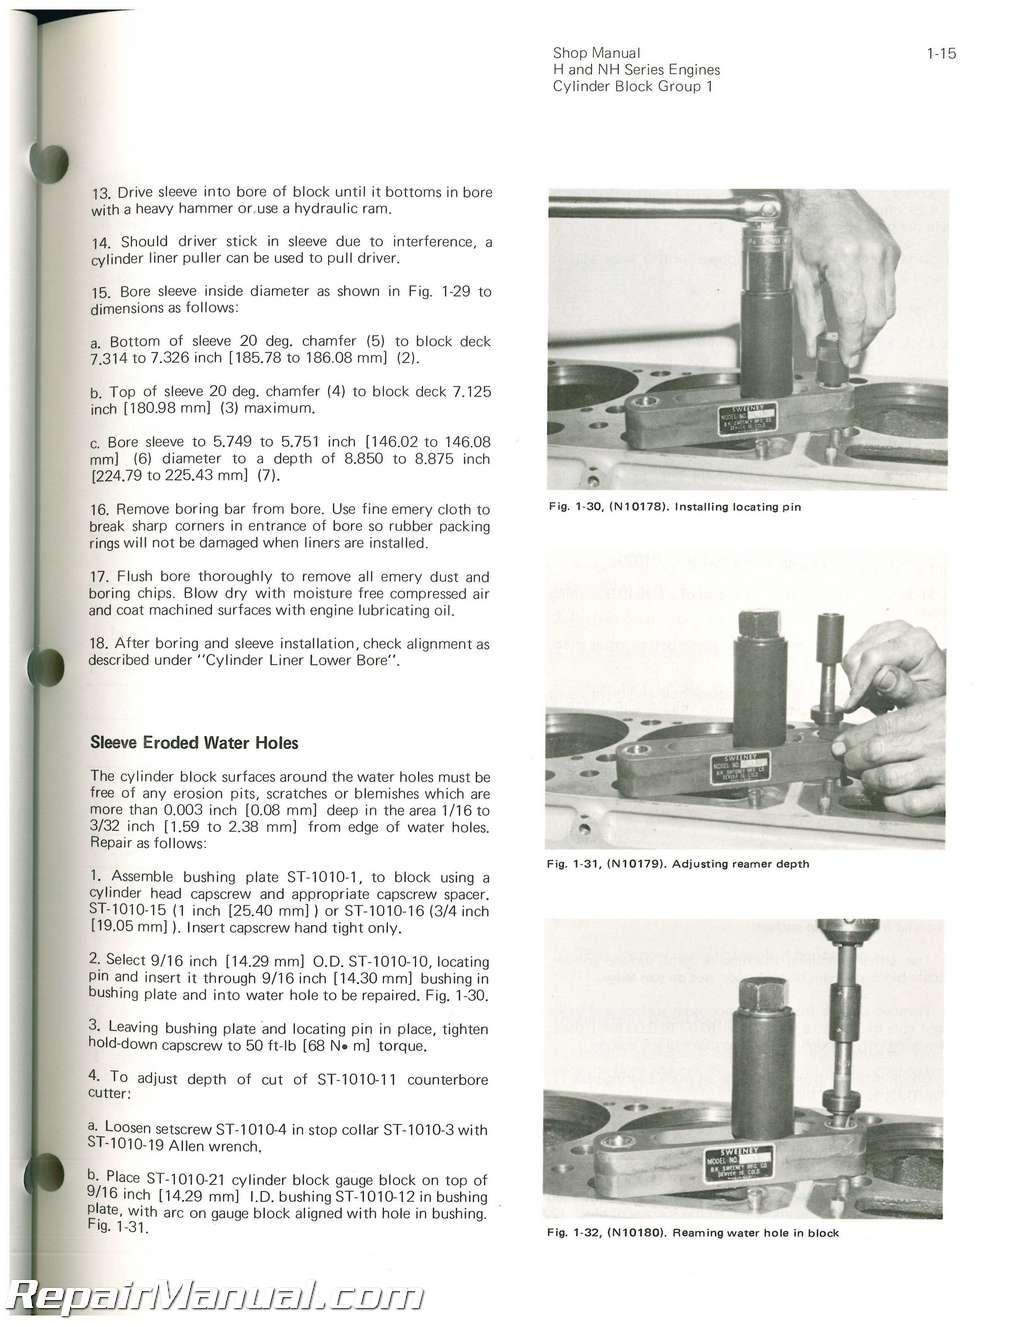 Hough Tractor Manuals